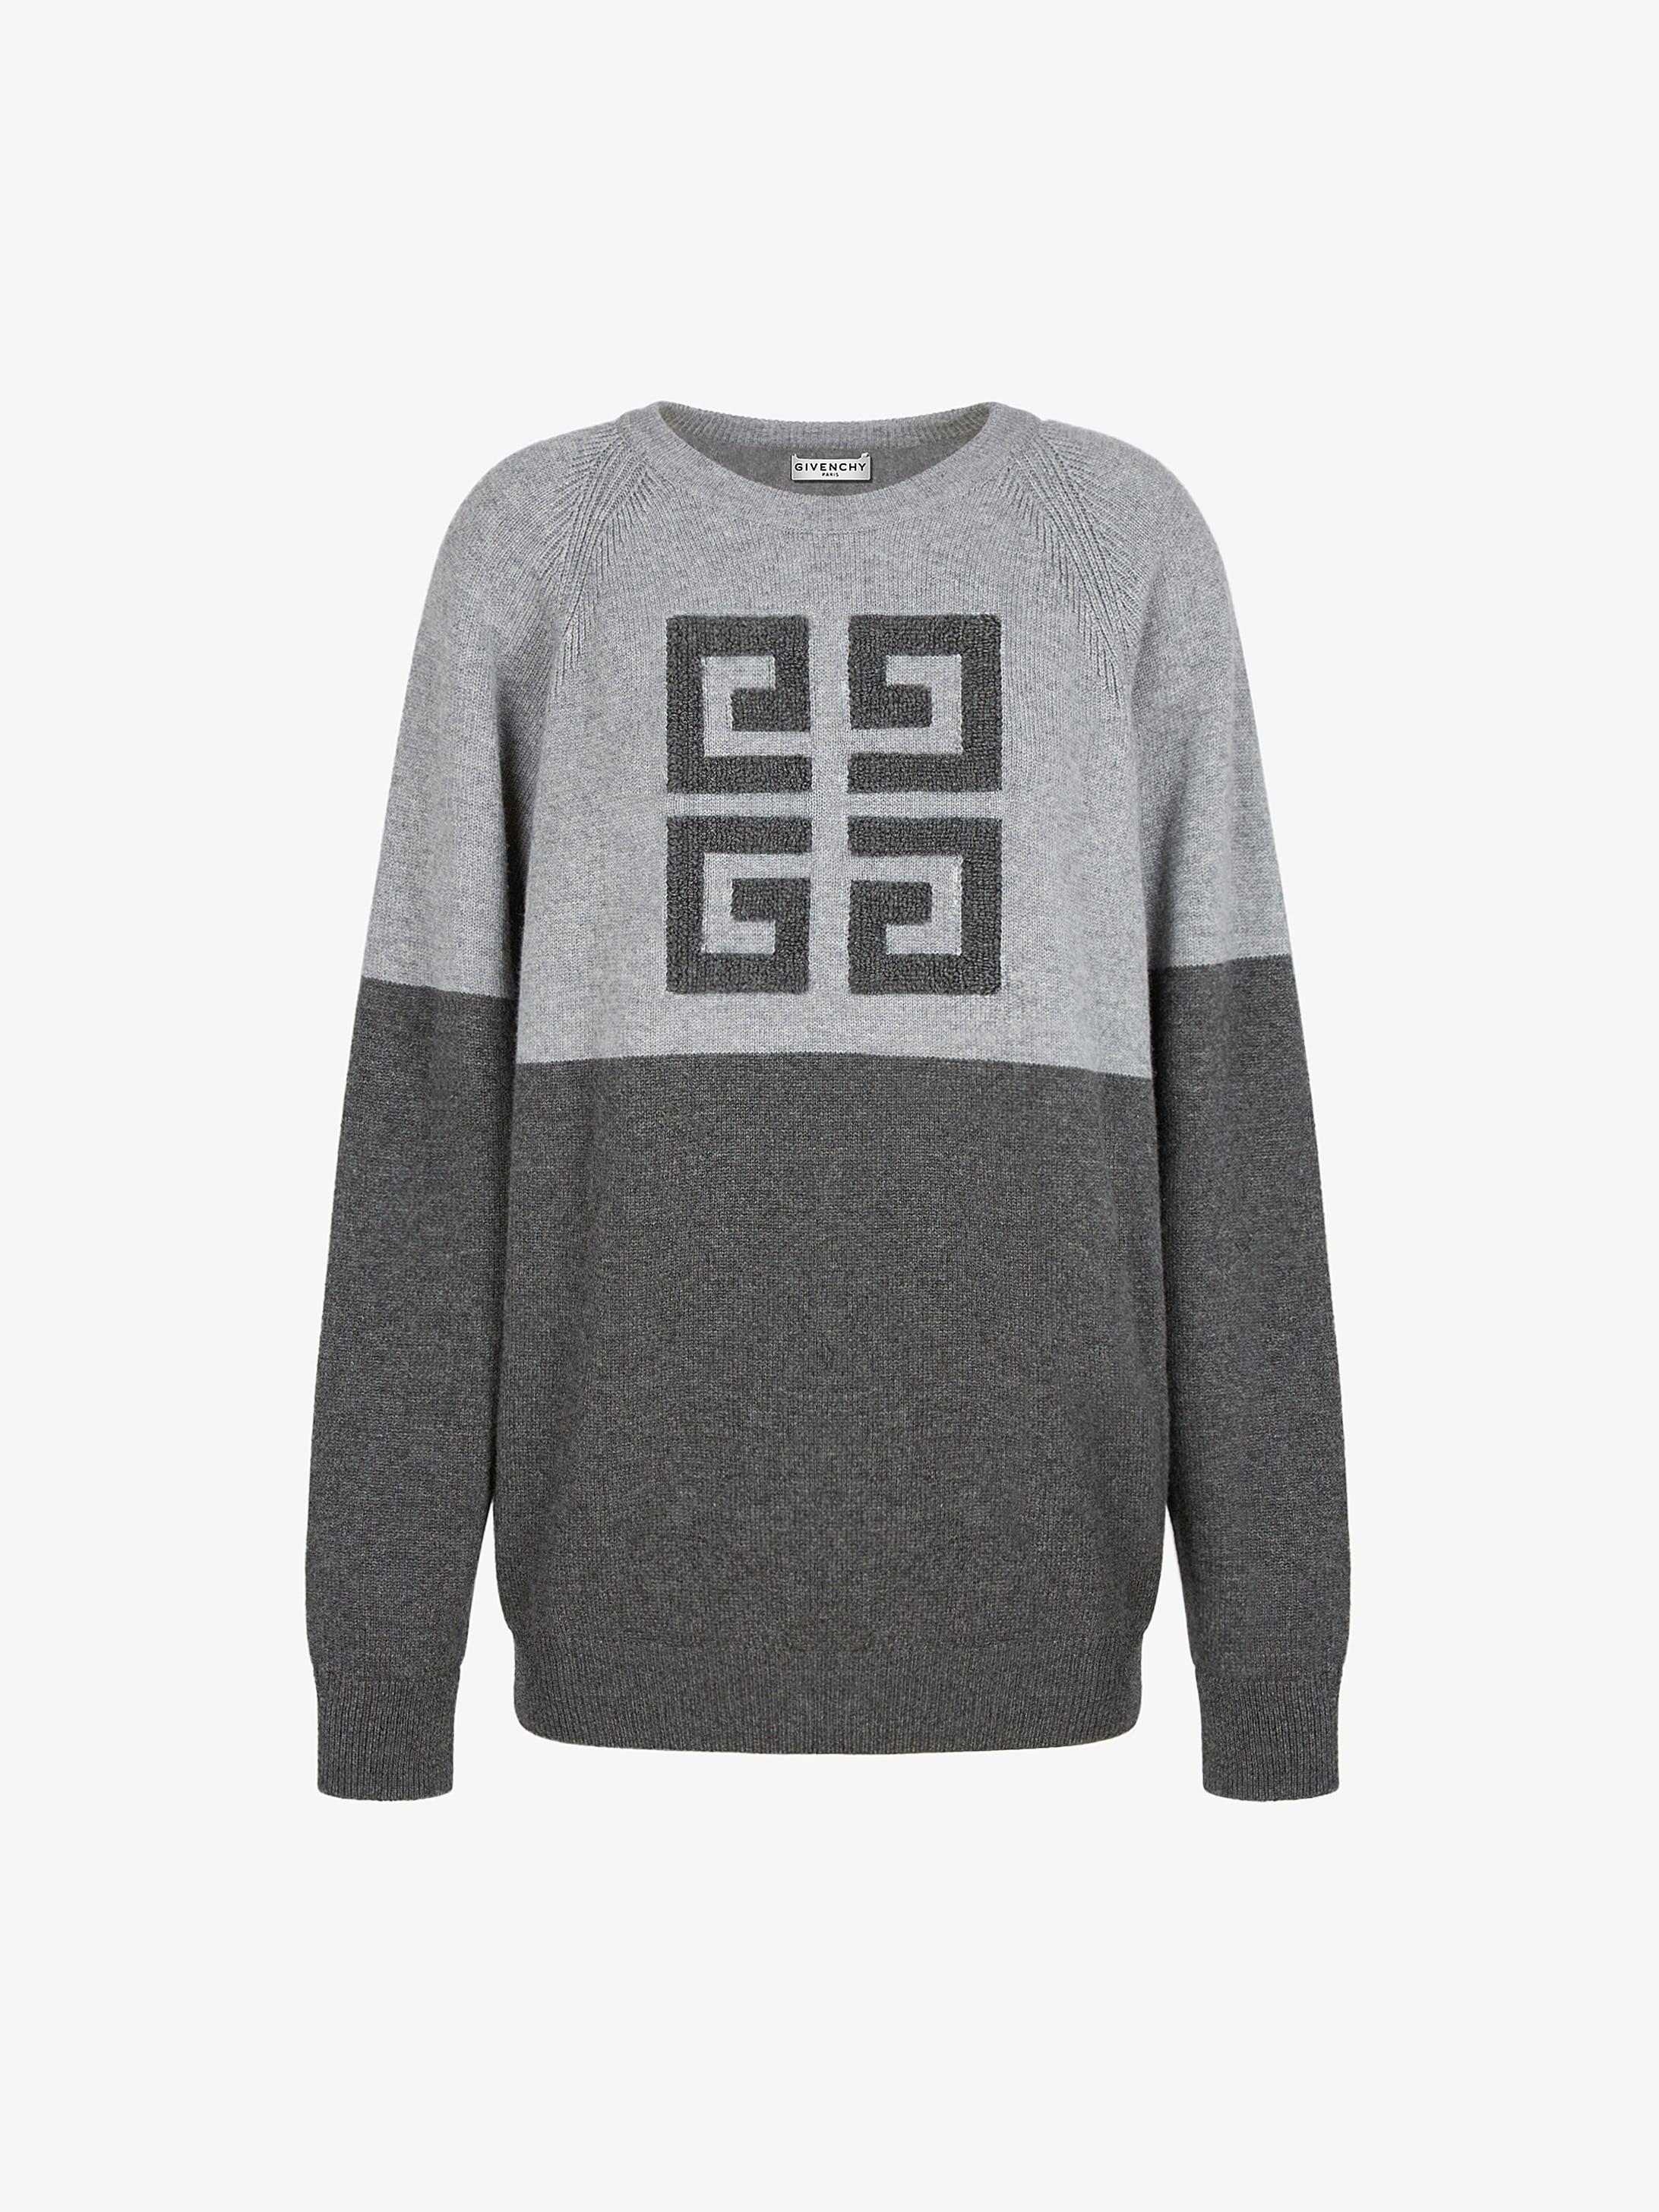 4G LOGO双色针织衫